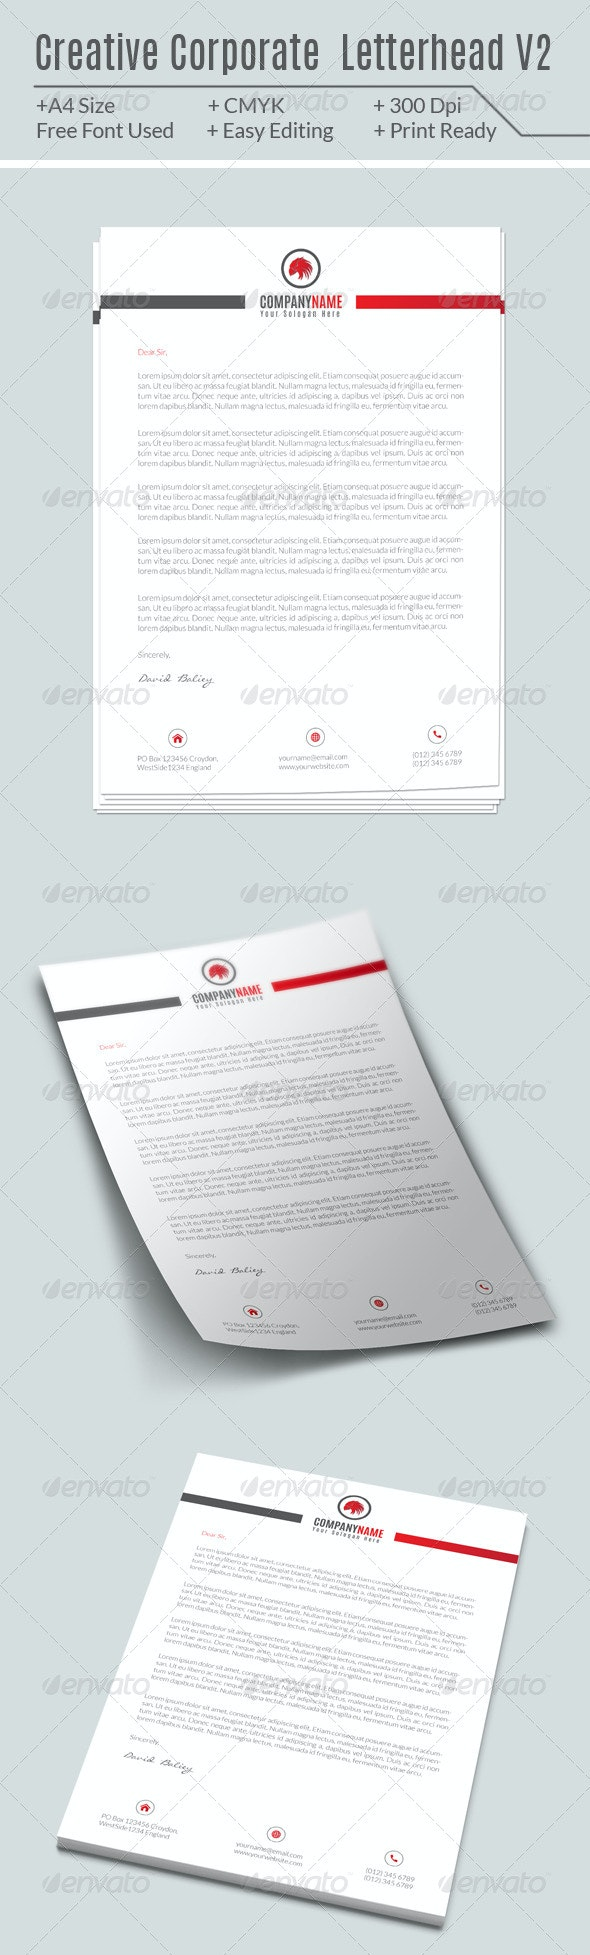 Creative Corporate Letterhead V2 - Miscellaneous Print Templates